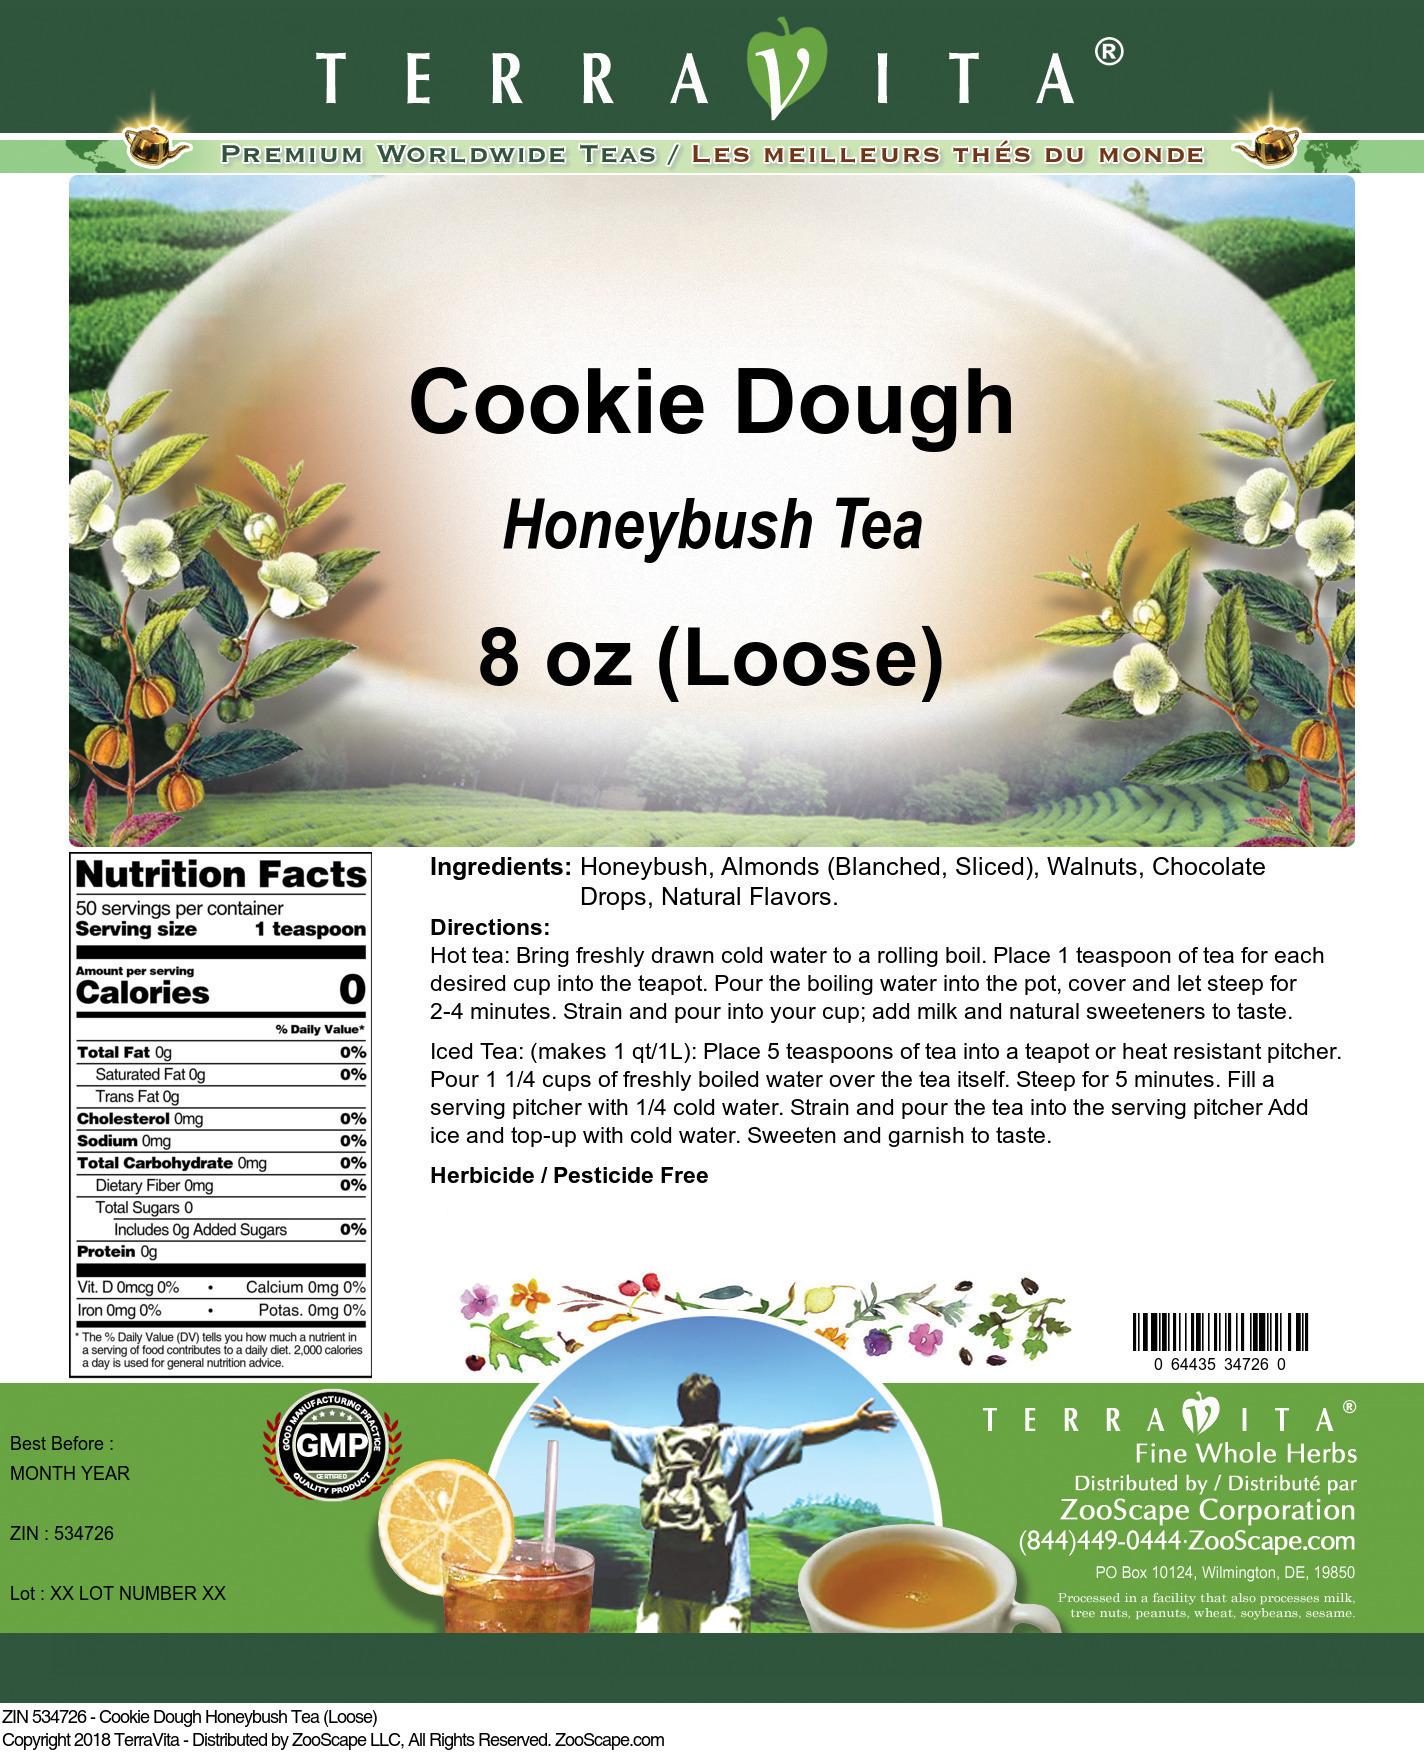 Cookie Dough Honeybush Tea